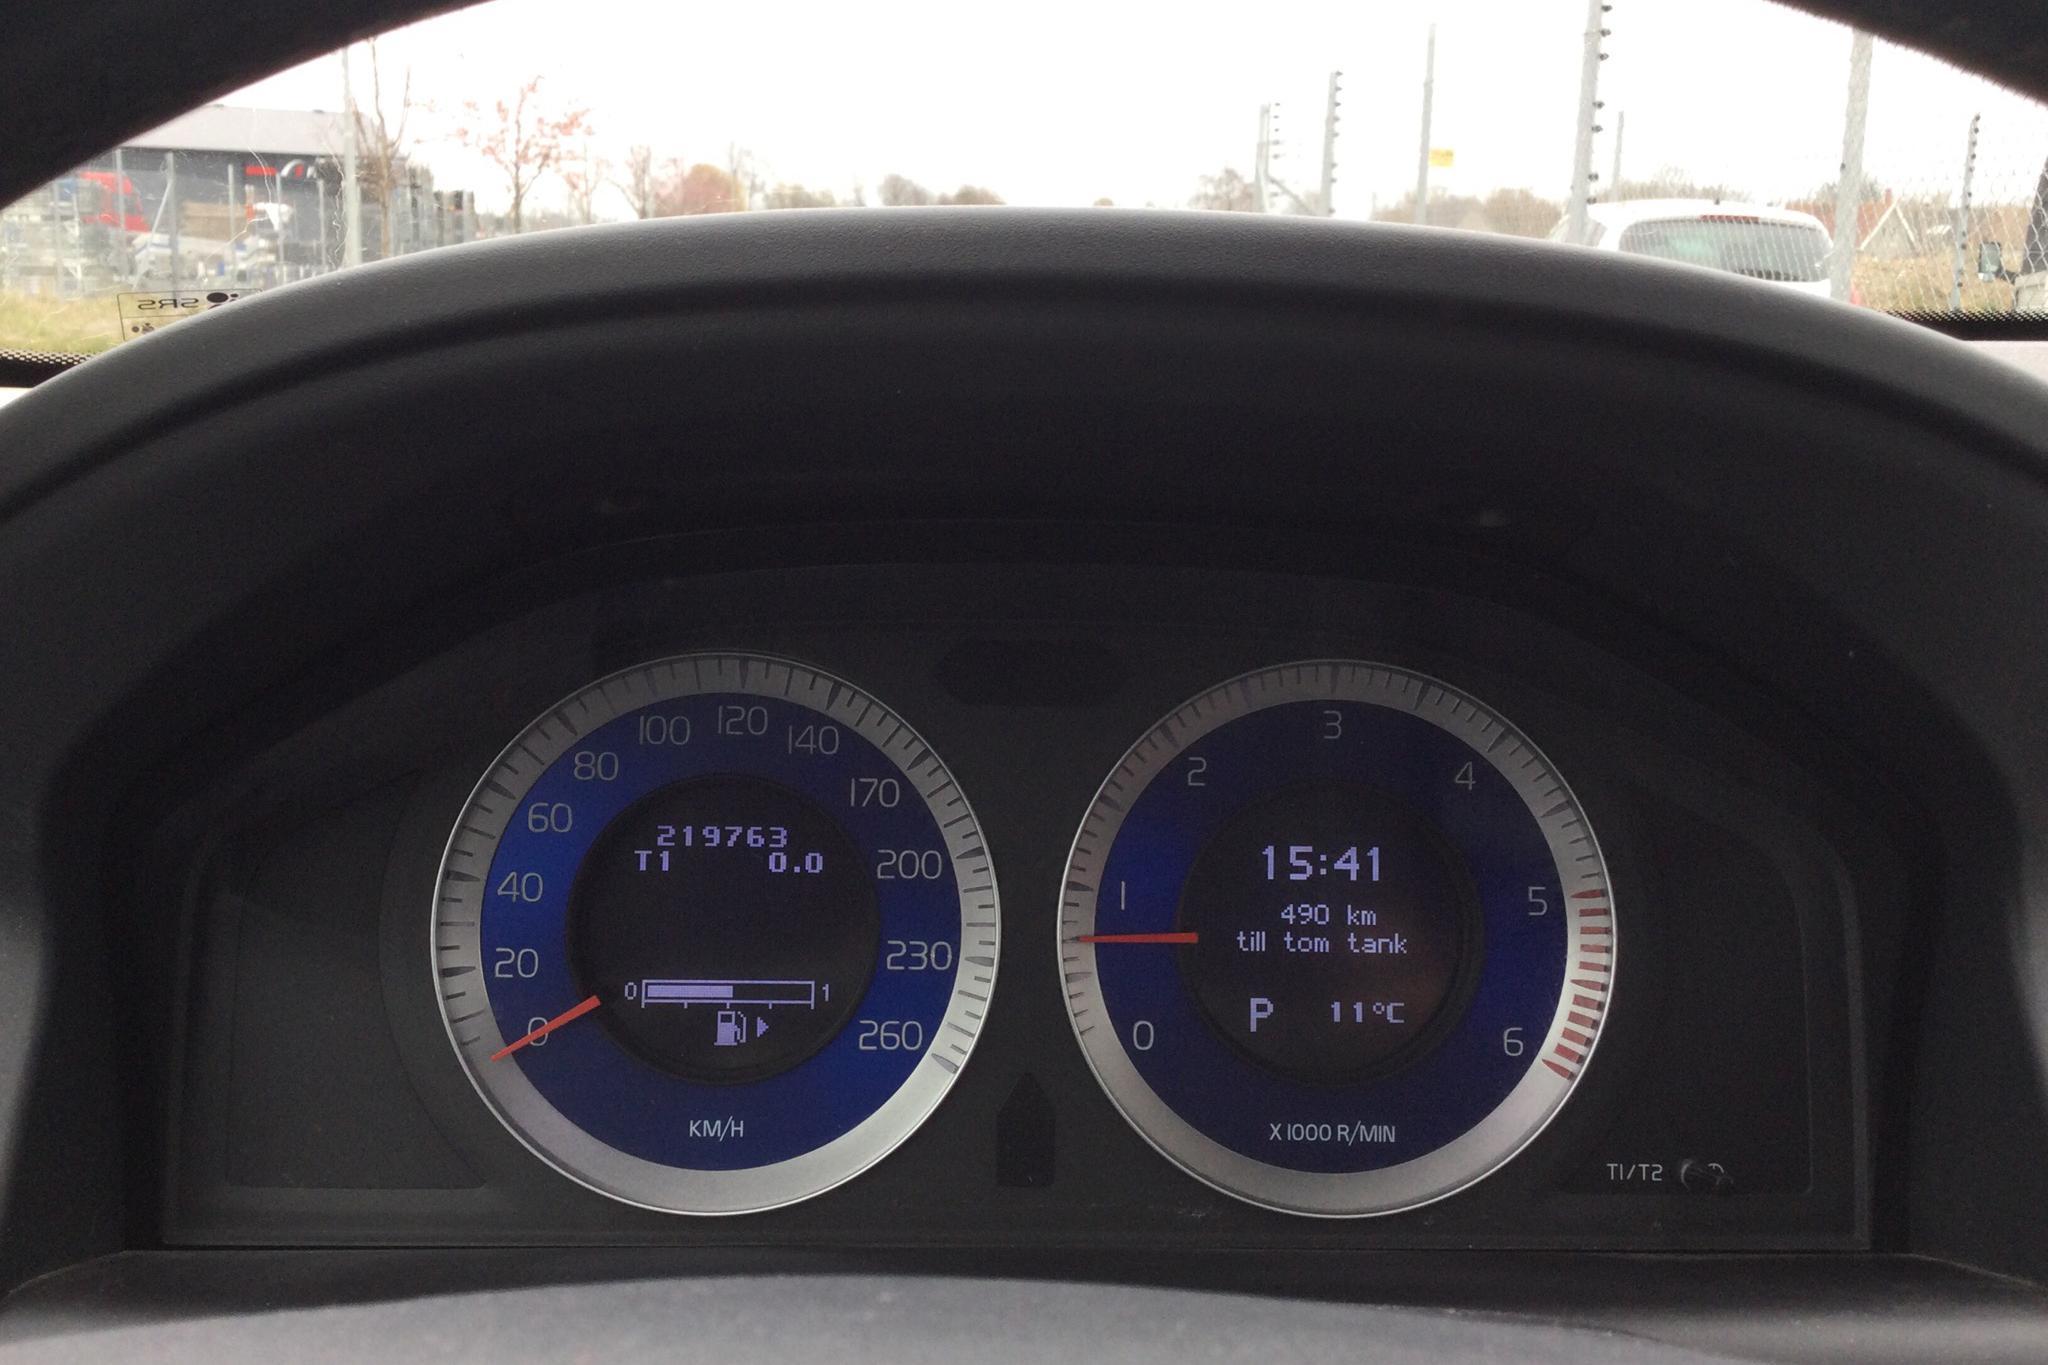 Volvo XC60 D5 AWD (205hk) - 219 770 km - Automatic - white - 2011